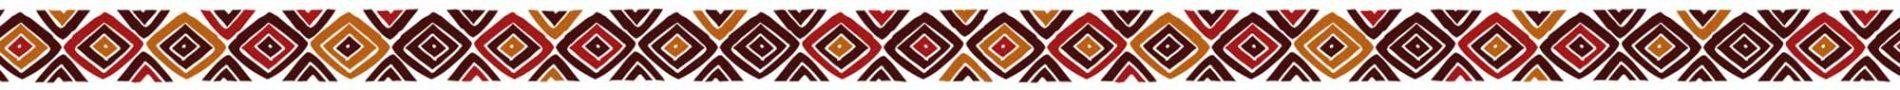 Safari tanzania Agencia viajes Africaatumedida